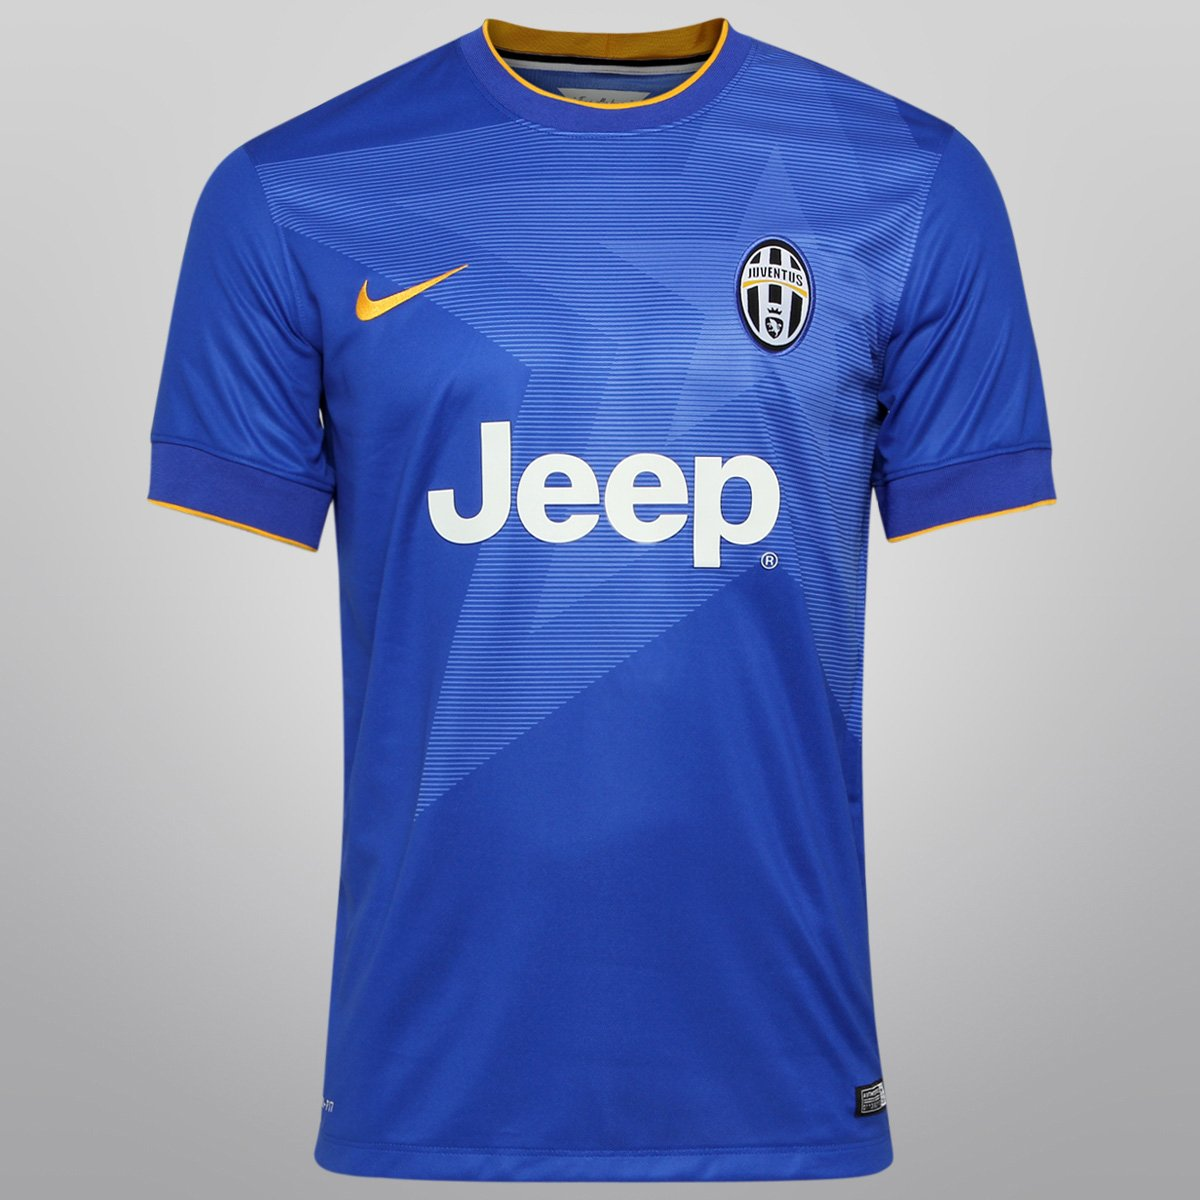 a29a0e84c Camisa Nike Juventus Away 14 15 s nº - Compre Agora